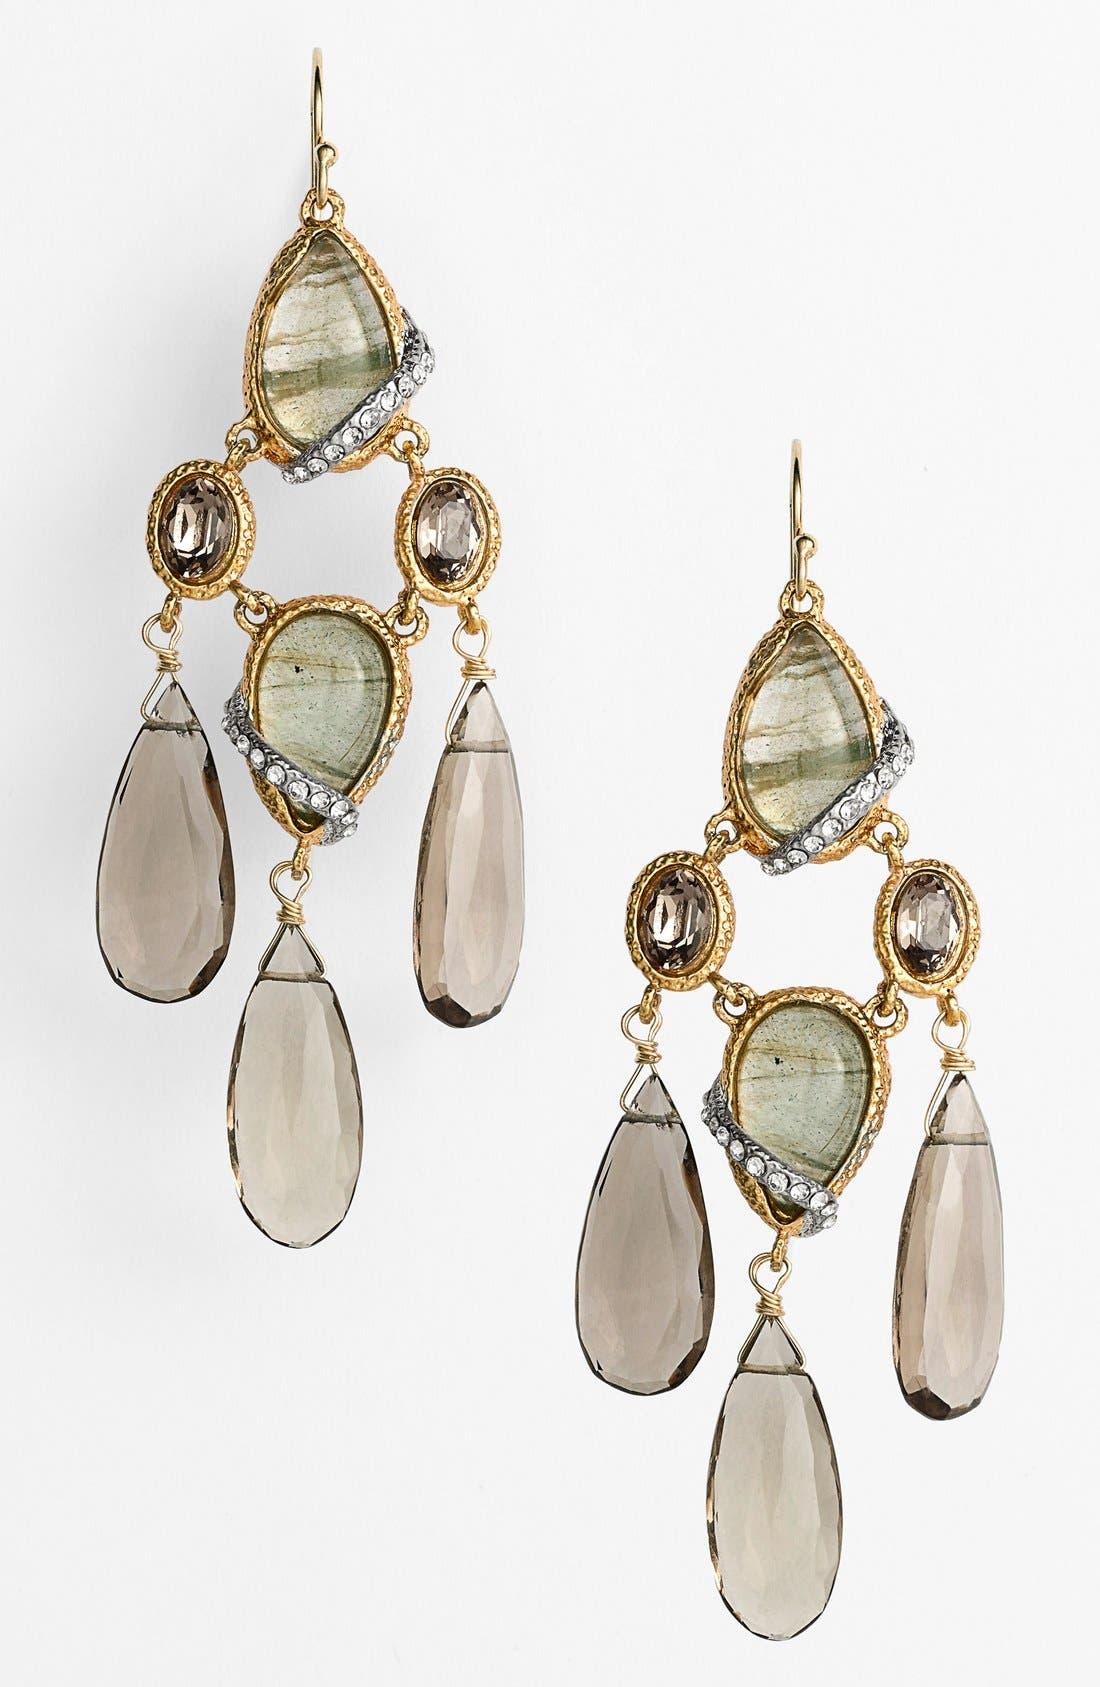 Main Image - Alexis Bittar 'Elements' Chandelier Earrings (Nordstrom Exclusive)